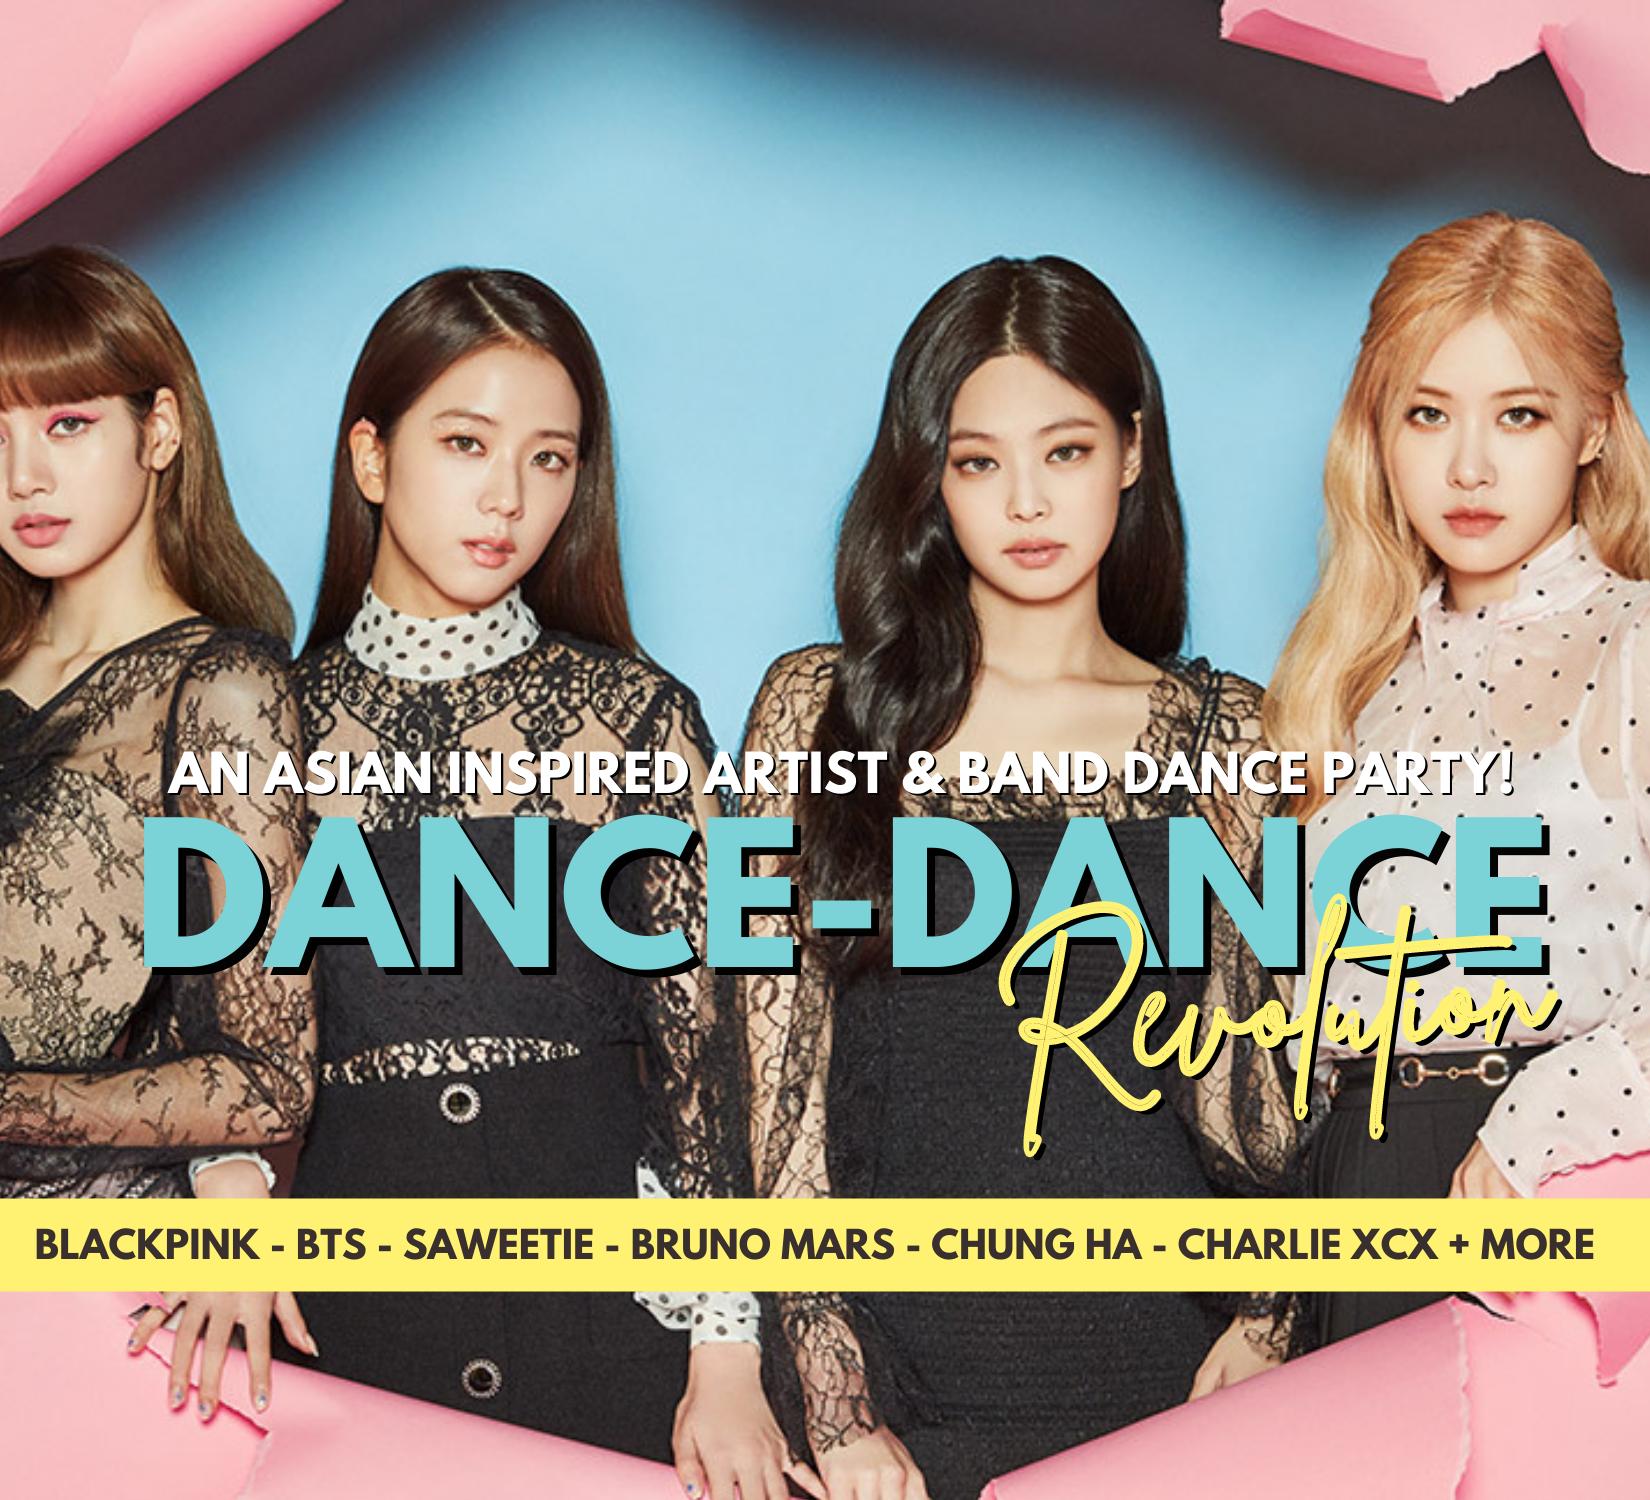 Dance-Dance Revolution!